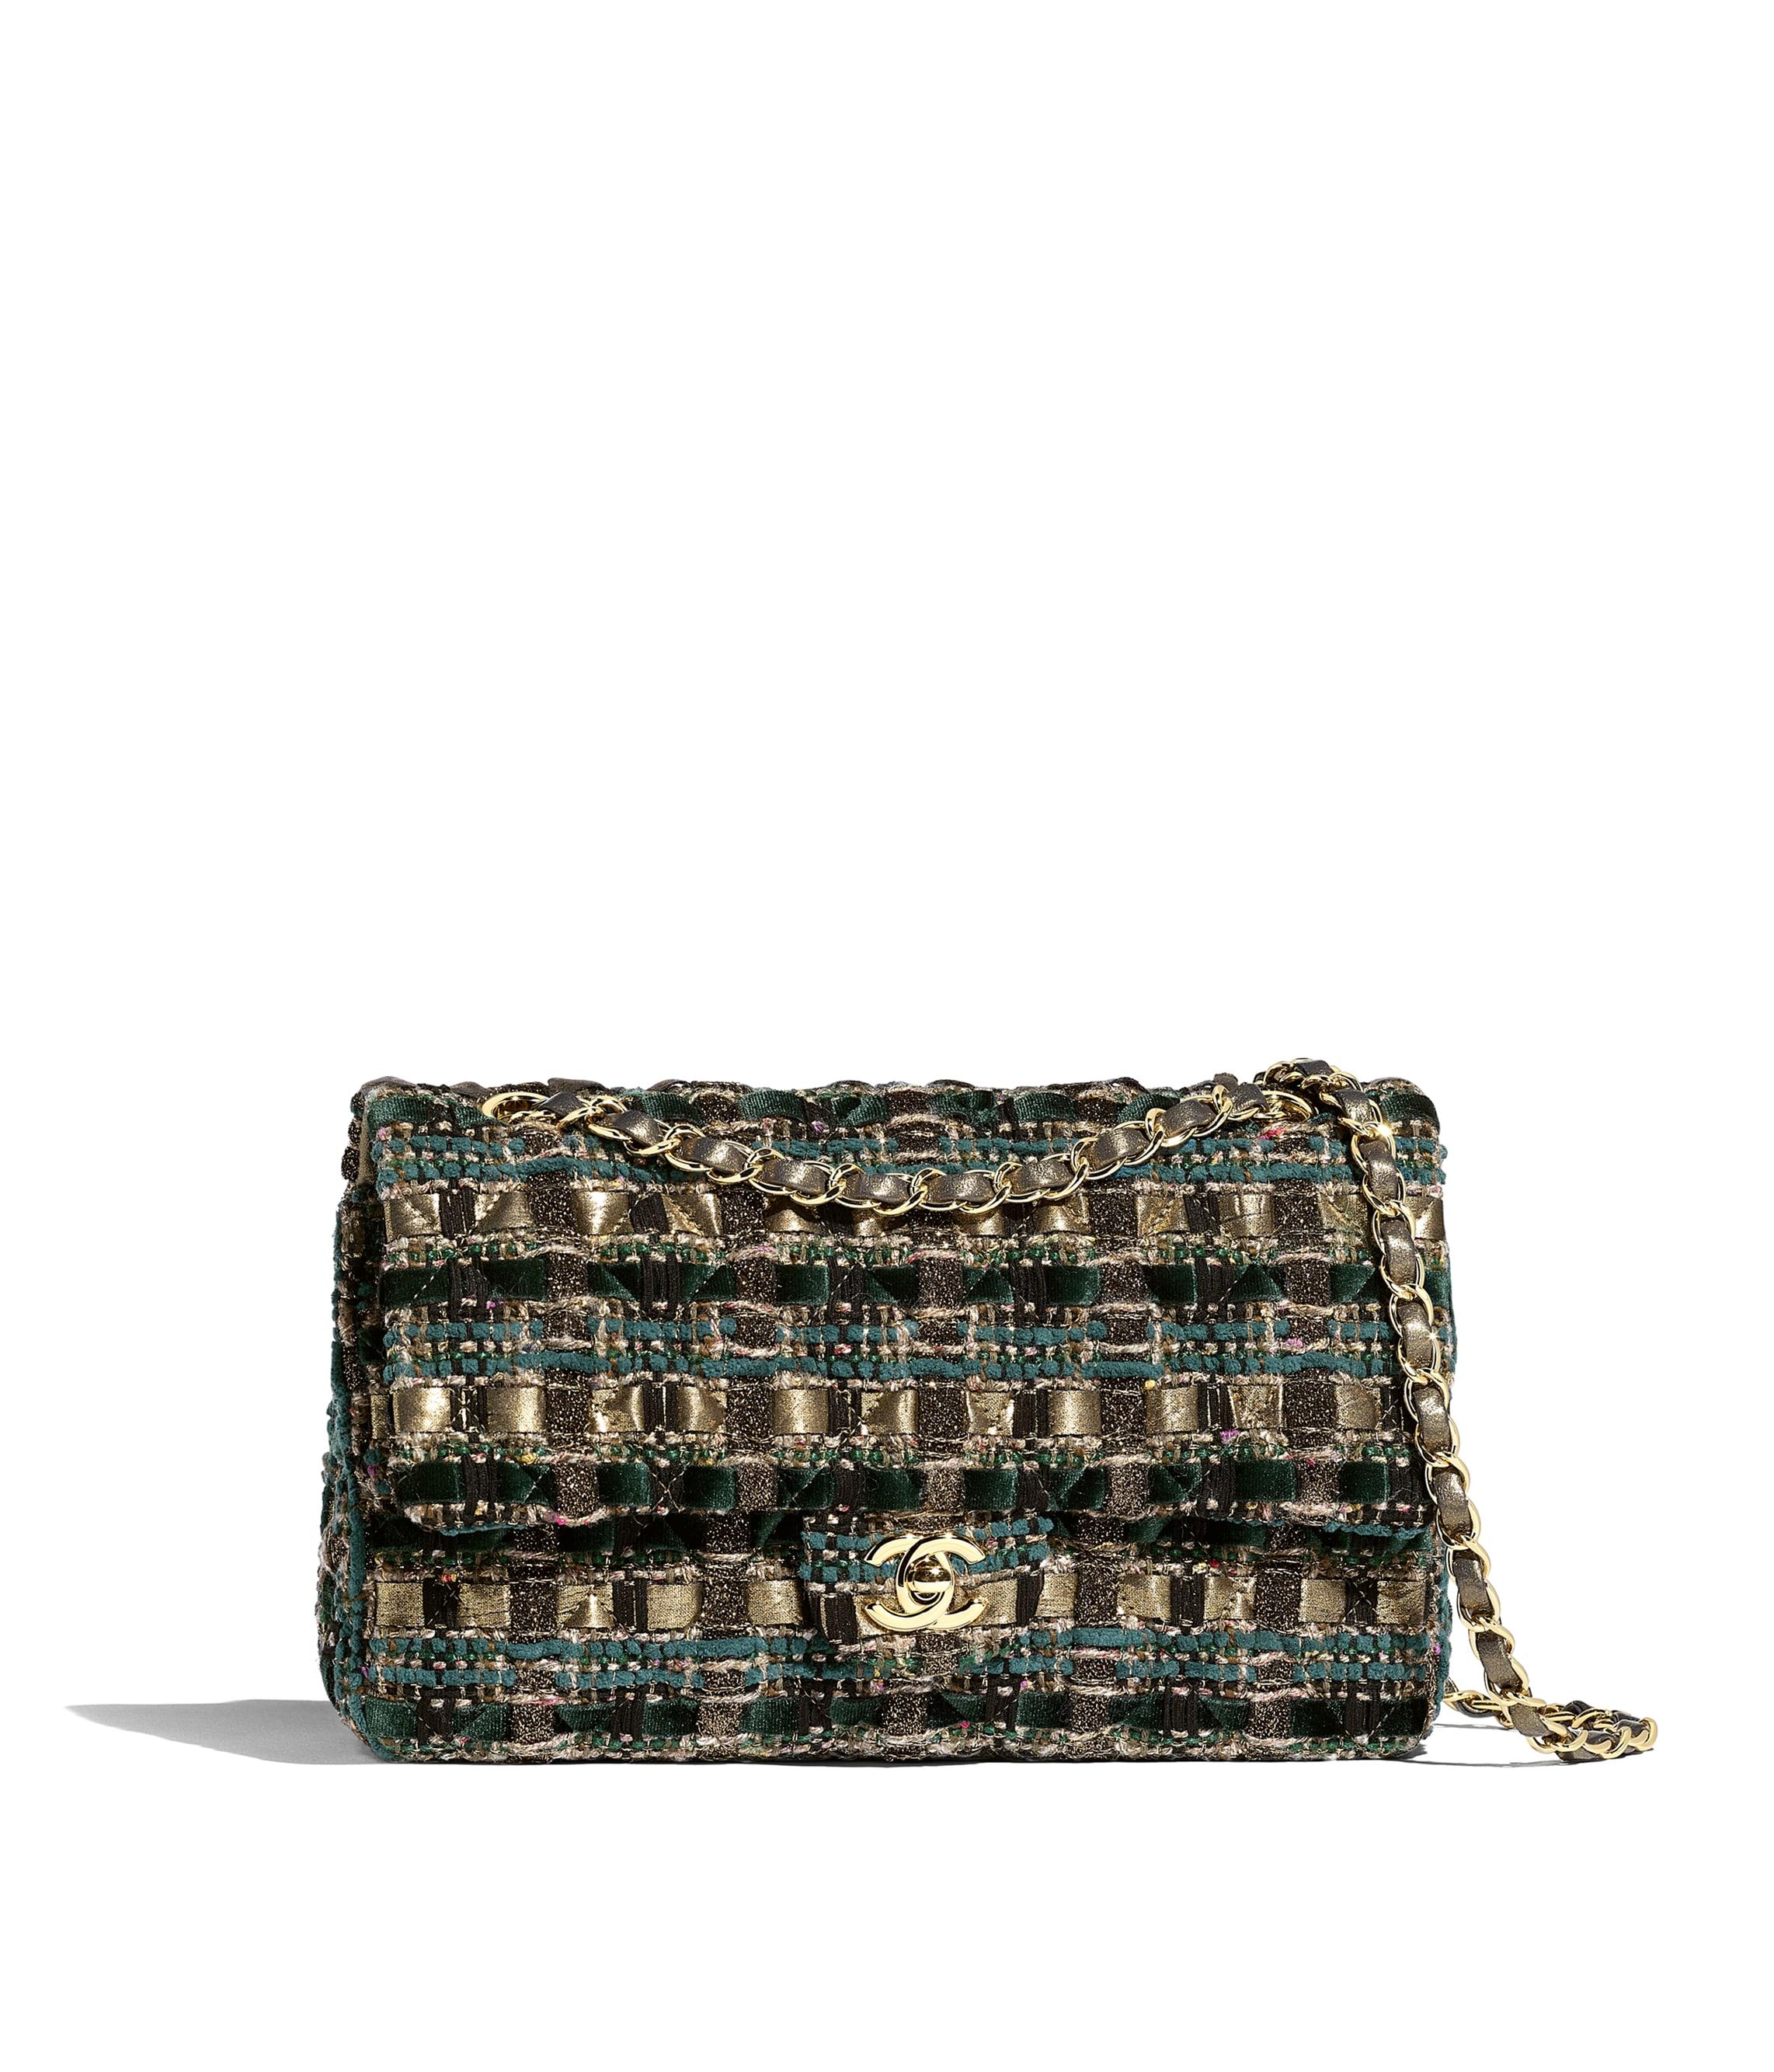 9f295fa83e4516 Classic Handbags - Handbags - CHANEL